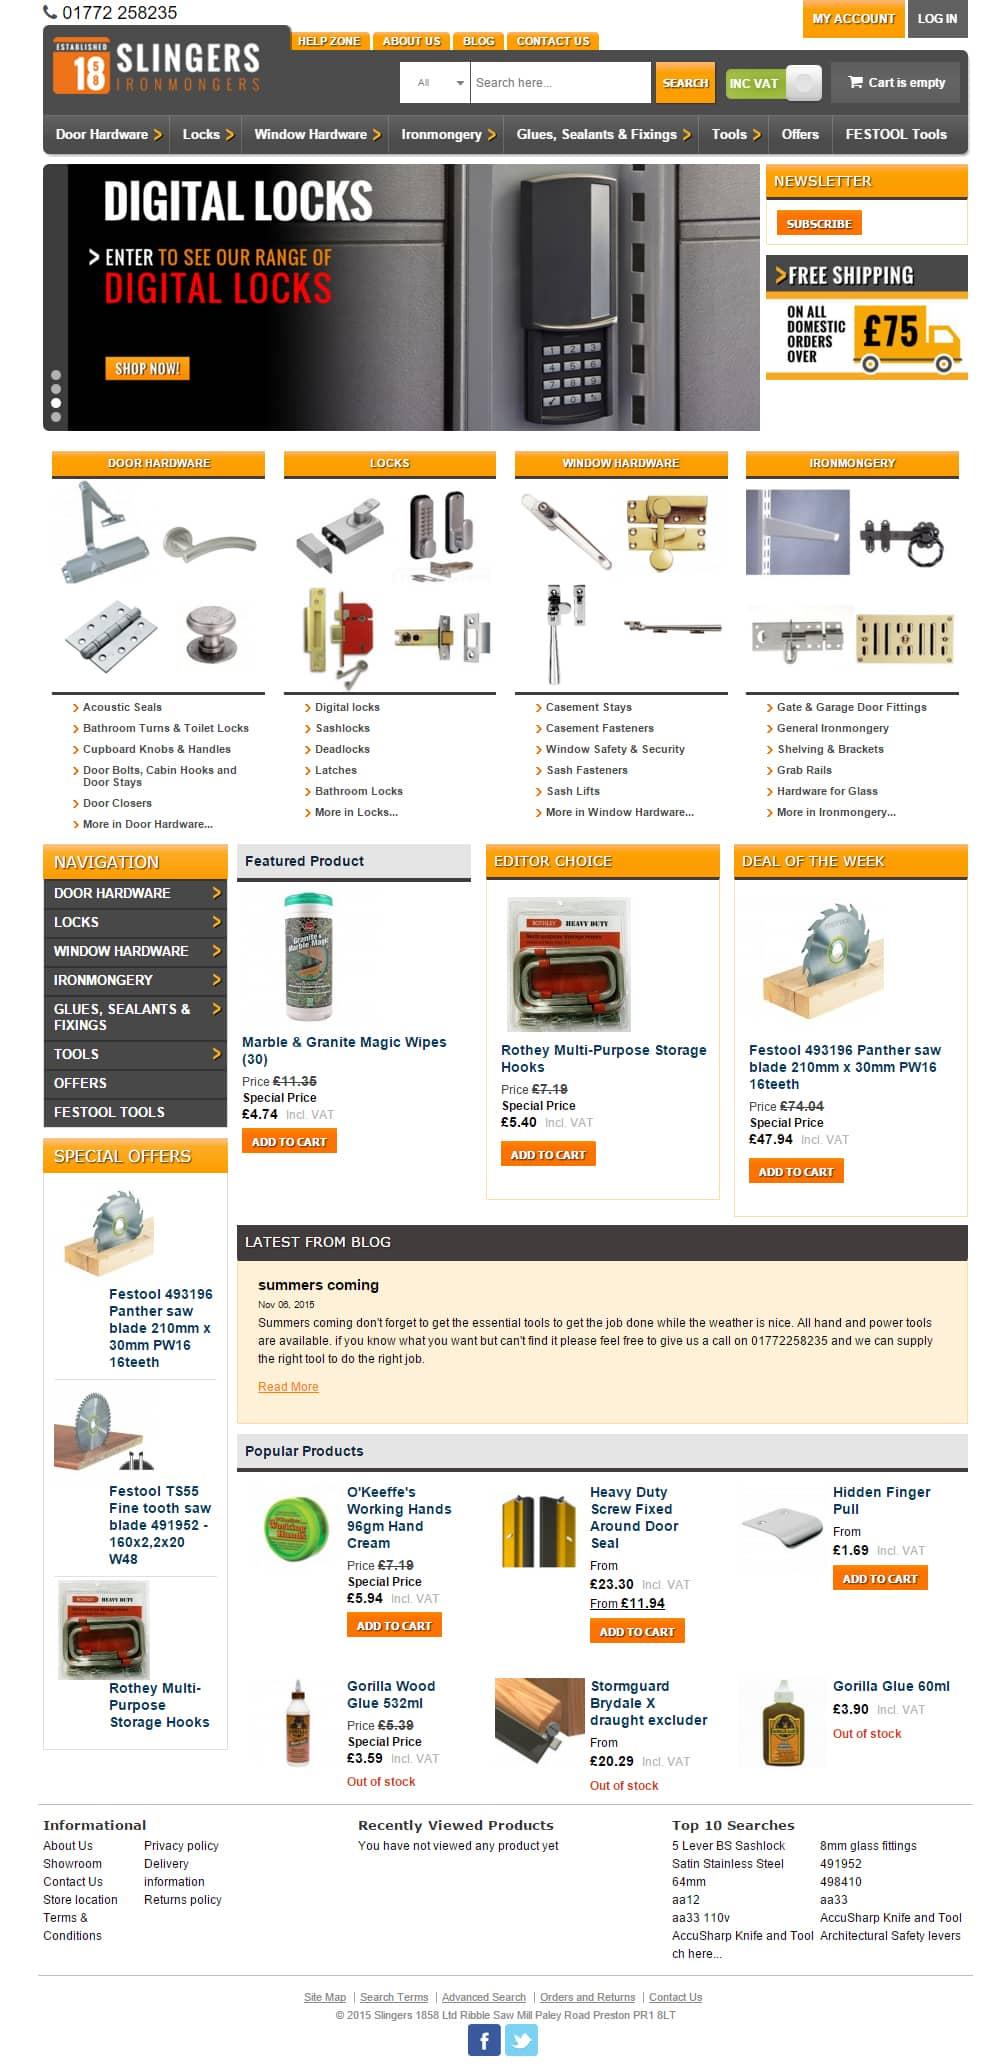 slingers iron mongers magento ecommerce website